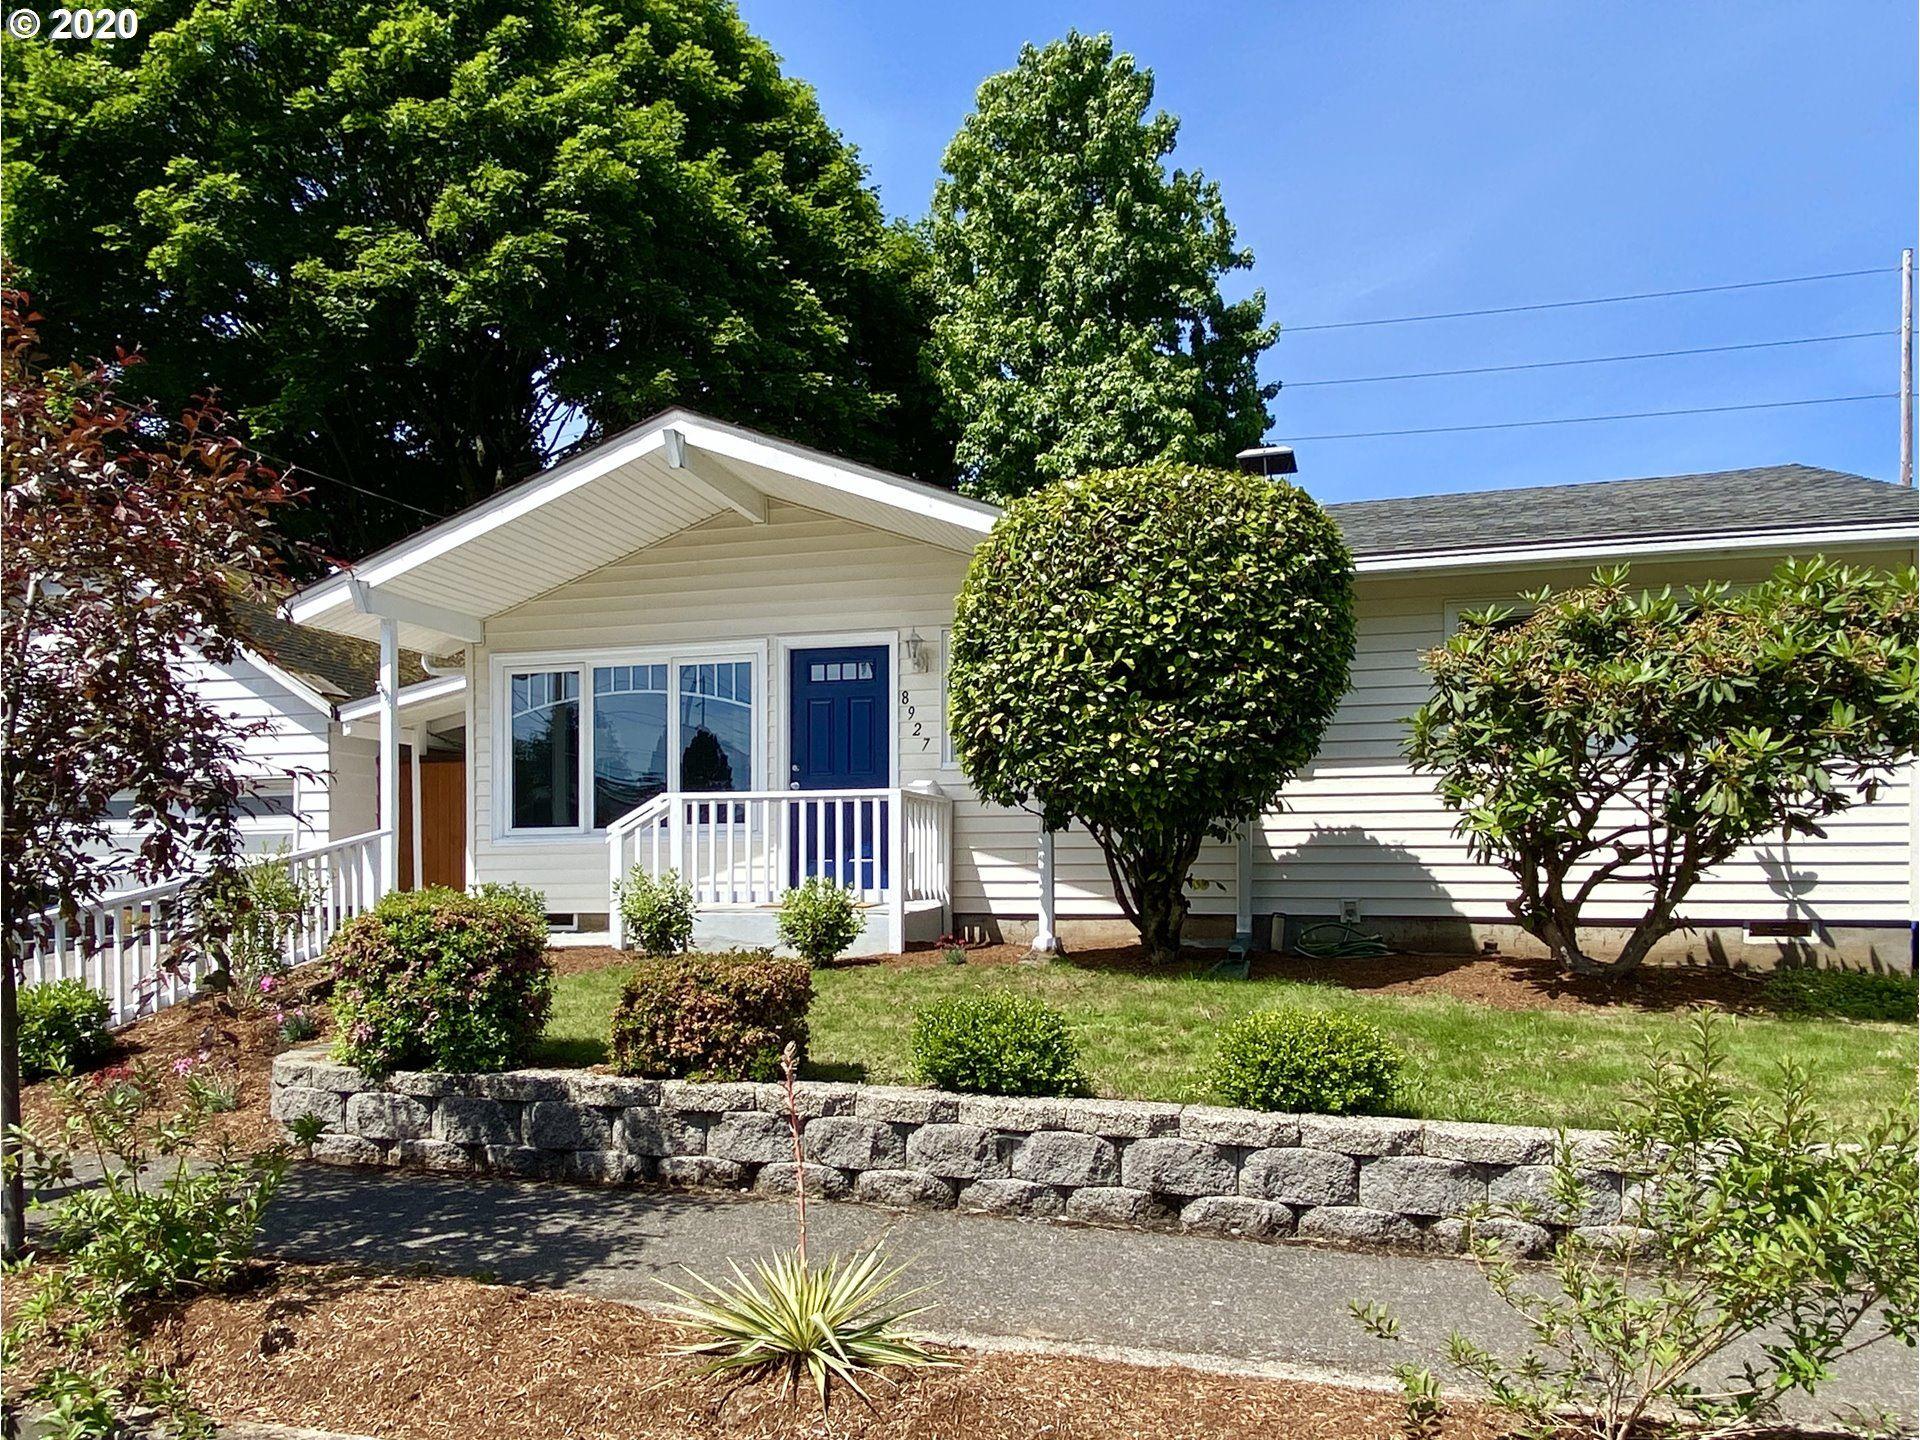 8927 N GENEVA AVE, Portland, OR 97203 - MLS#: 20219238